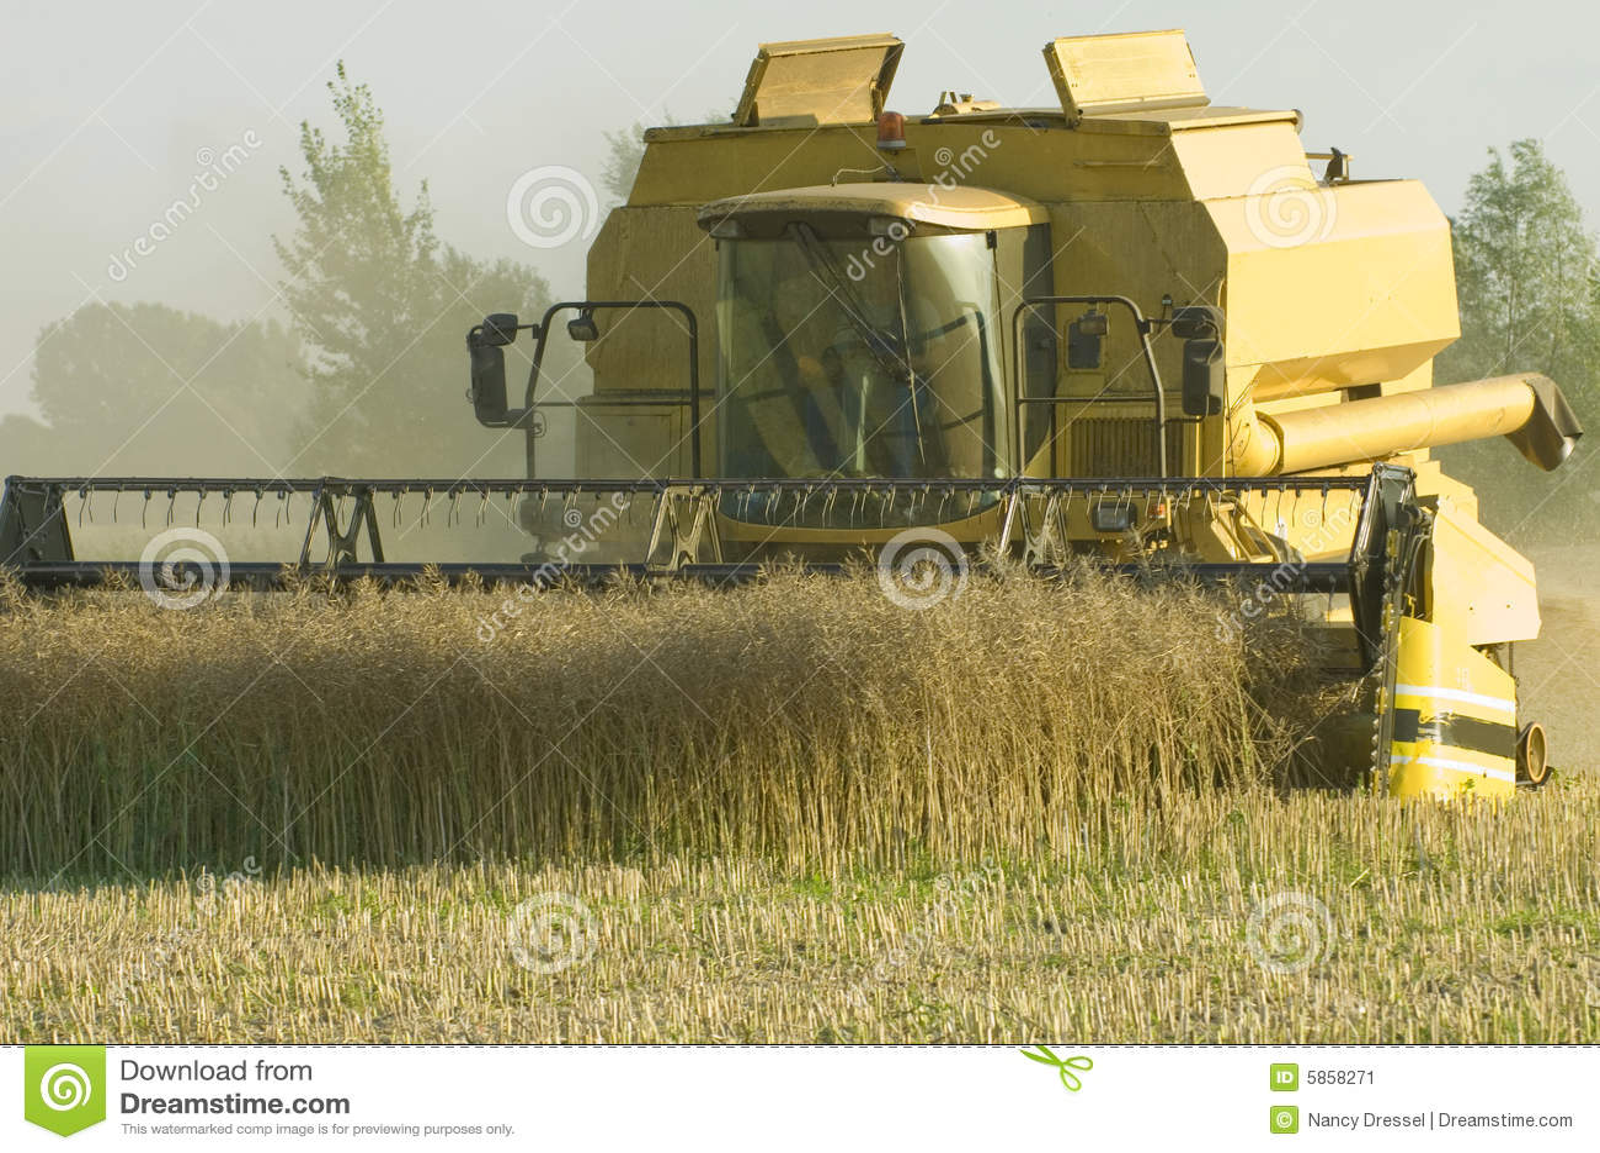 Combine corn earning harvester